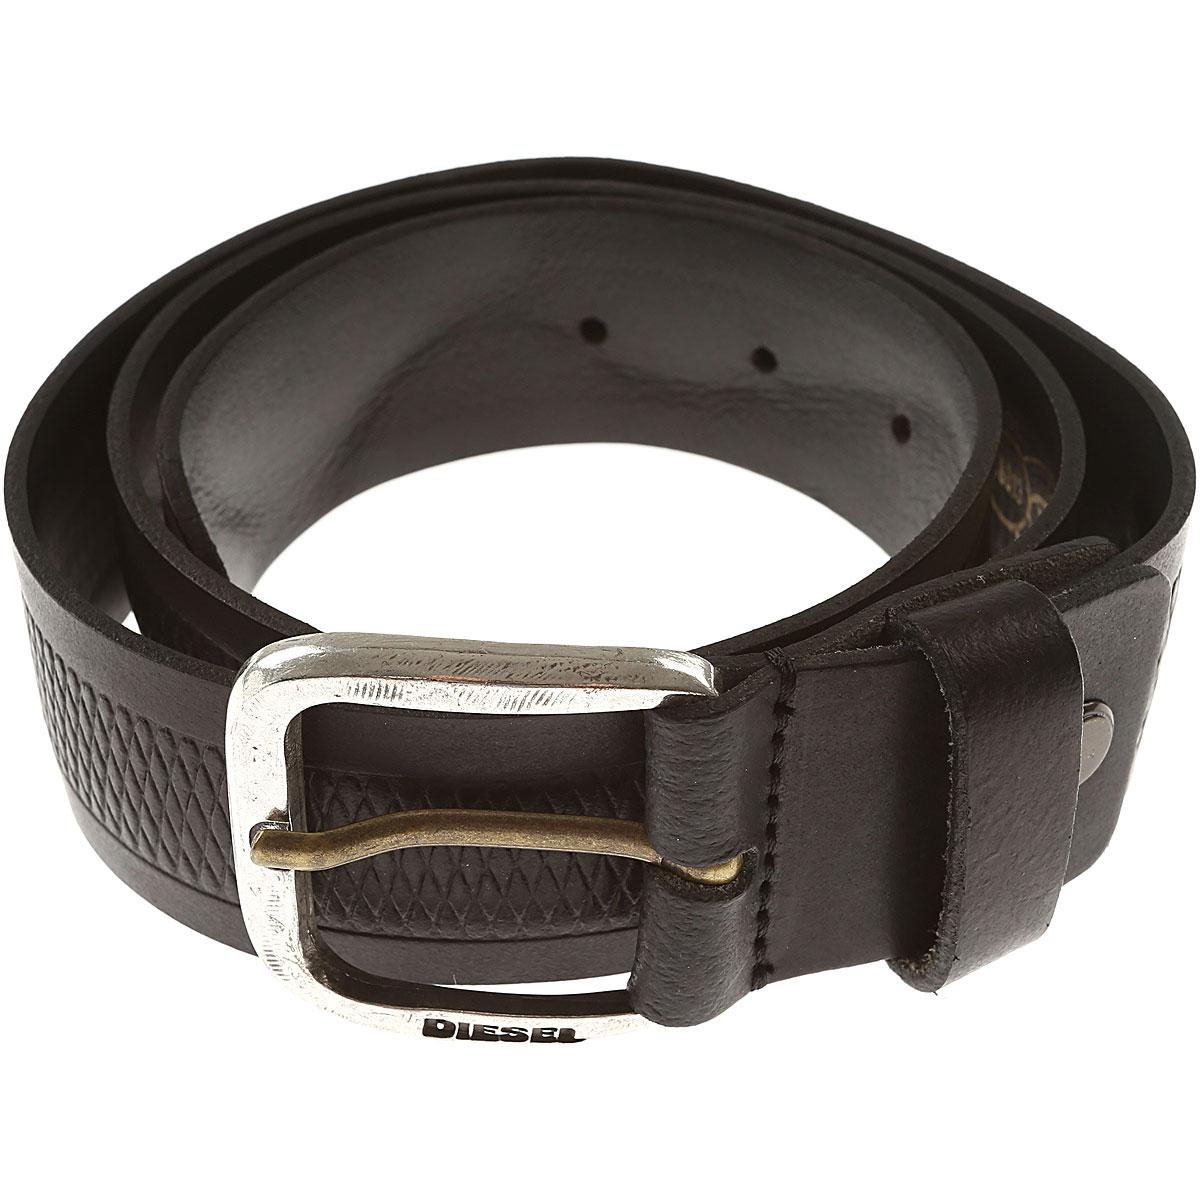 Diesel Belts For Men 107